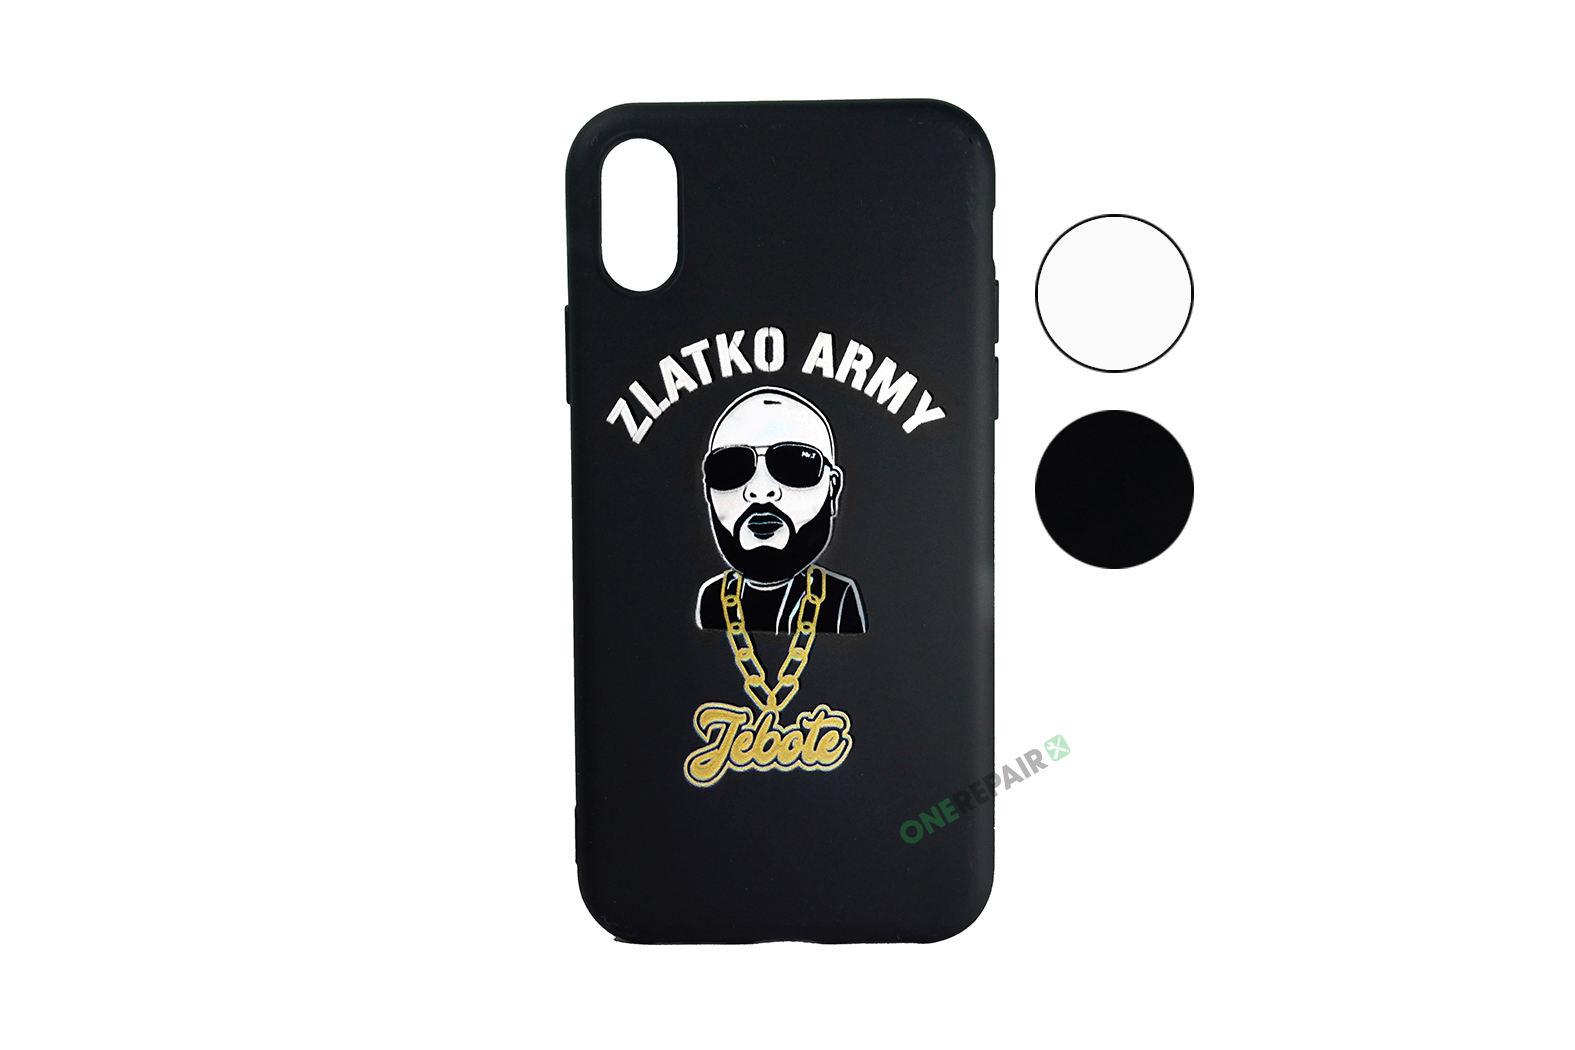 Zlatko Army cover til iPhone X og XS